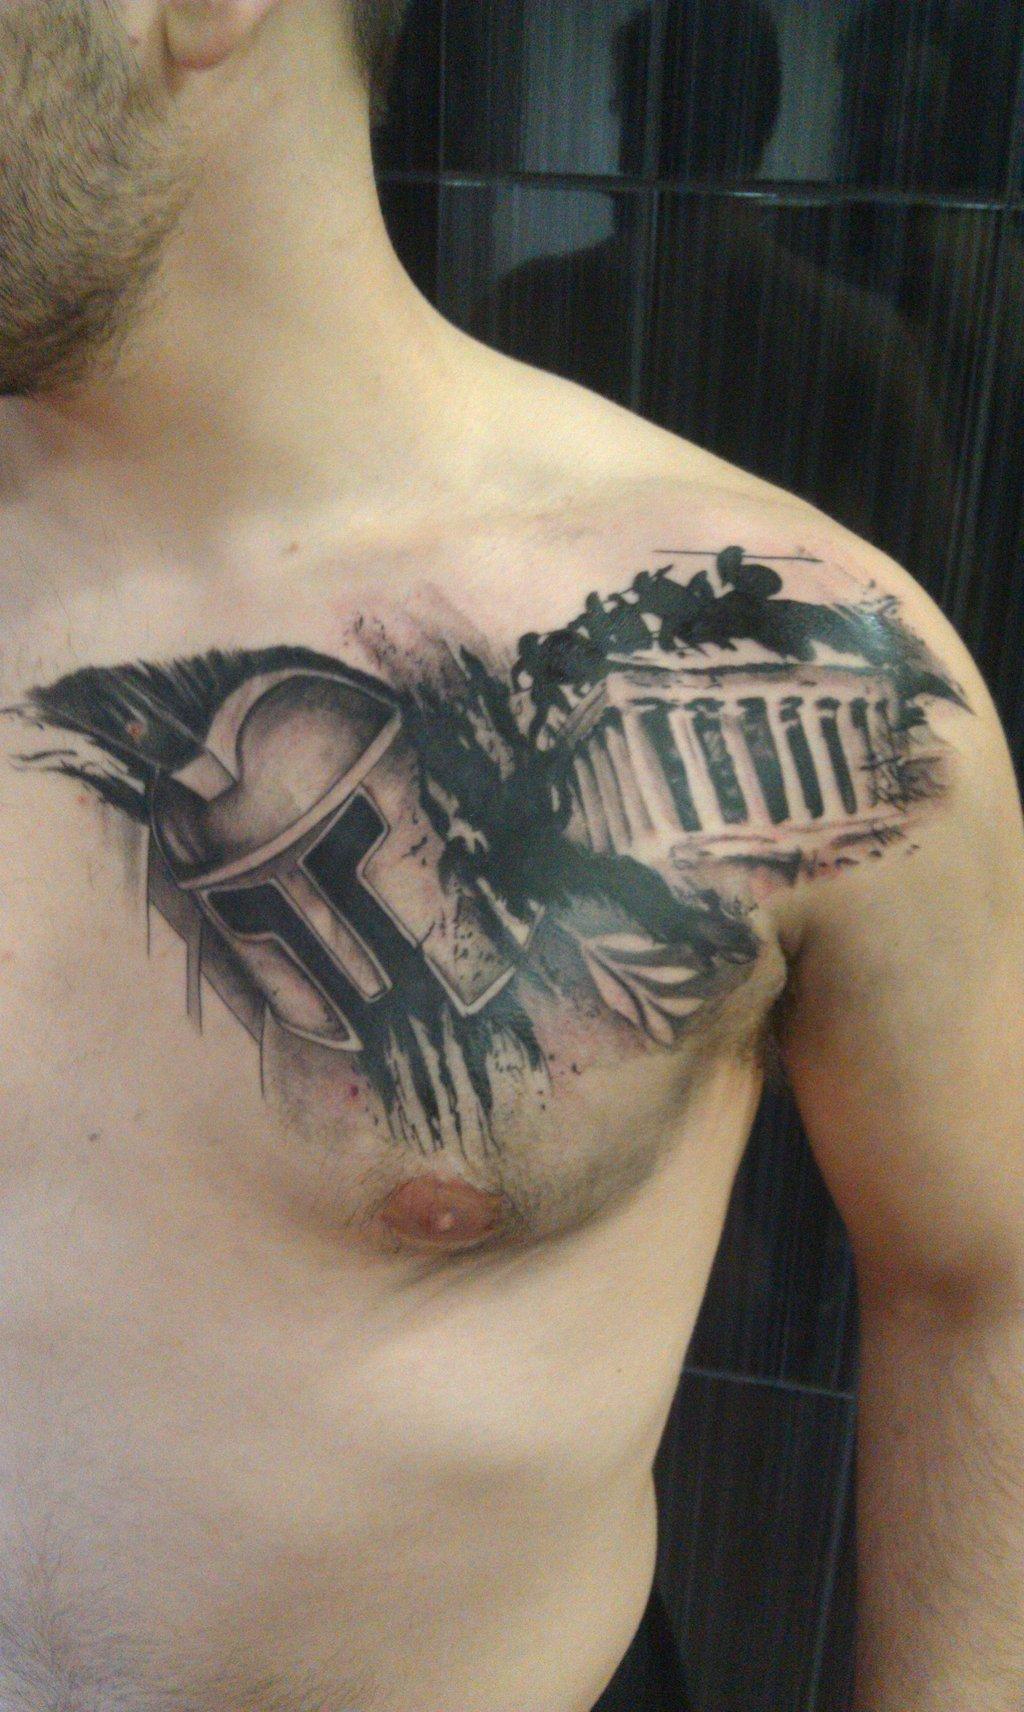 Greek spartan tattoo designs the image for Fraternity tattoo ideas